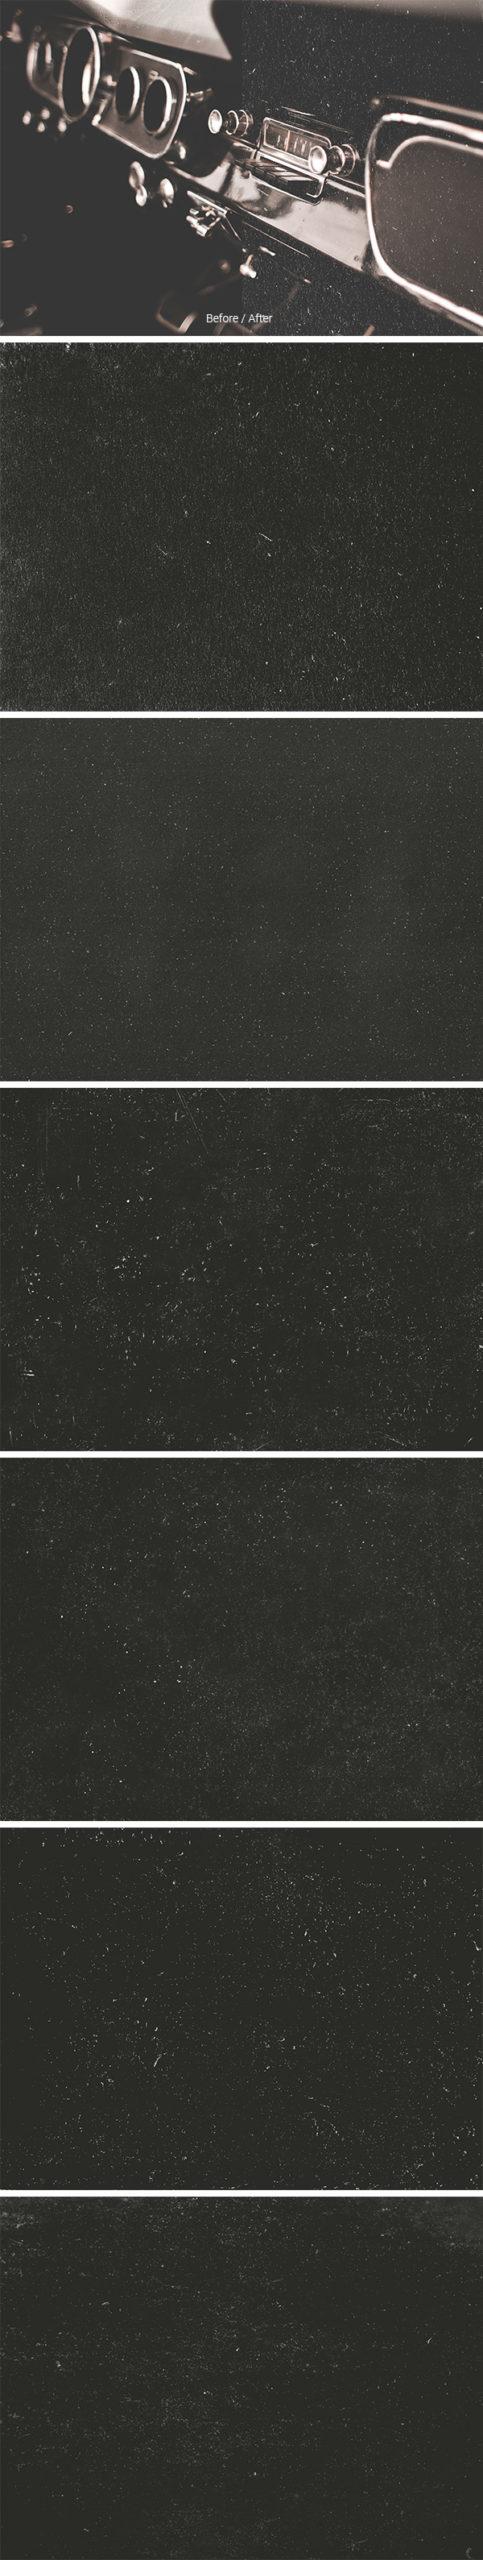 Dust-Noise-Overlay-Textures-600